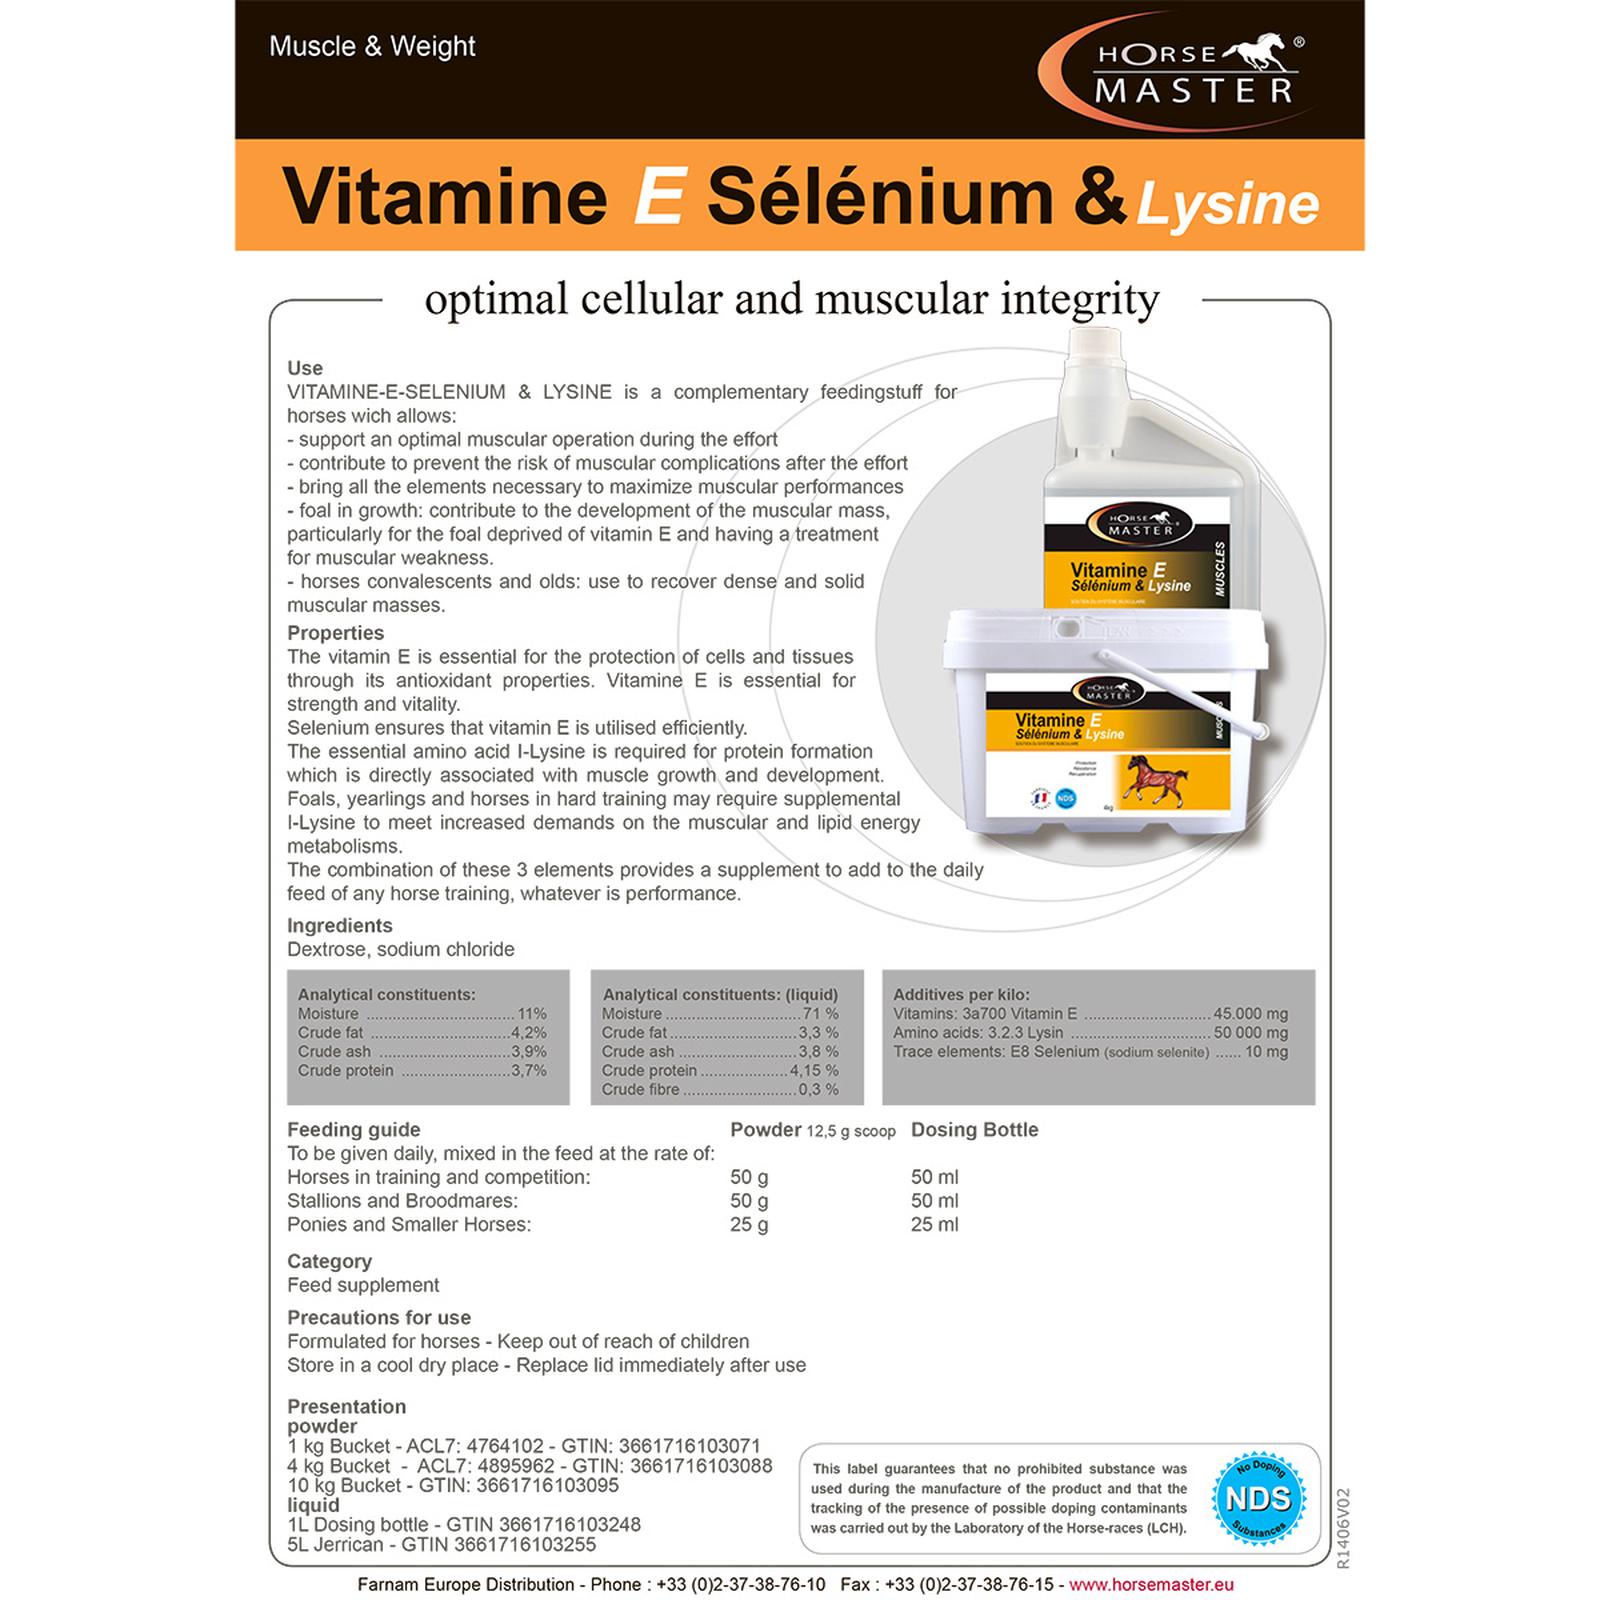 new high quality factory outlets wide varieties HorseMaster Vitamine E - Selenium - Lysine - Powder, 4 kg